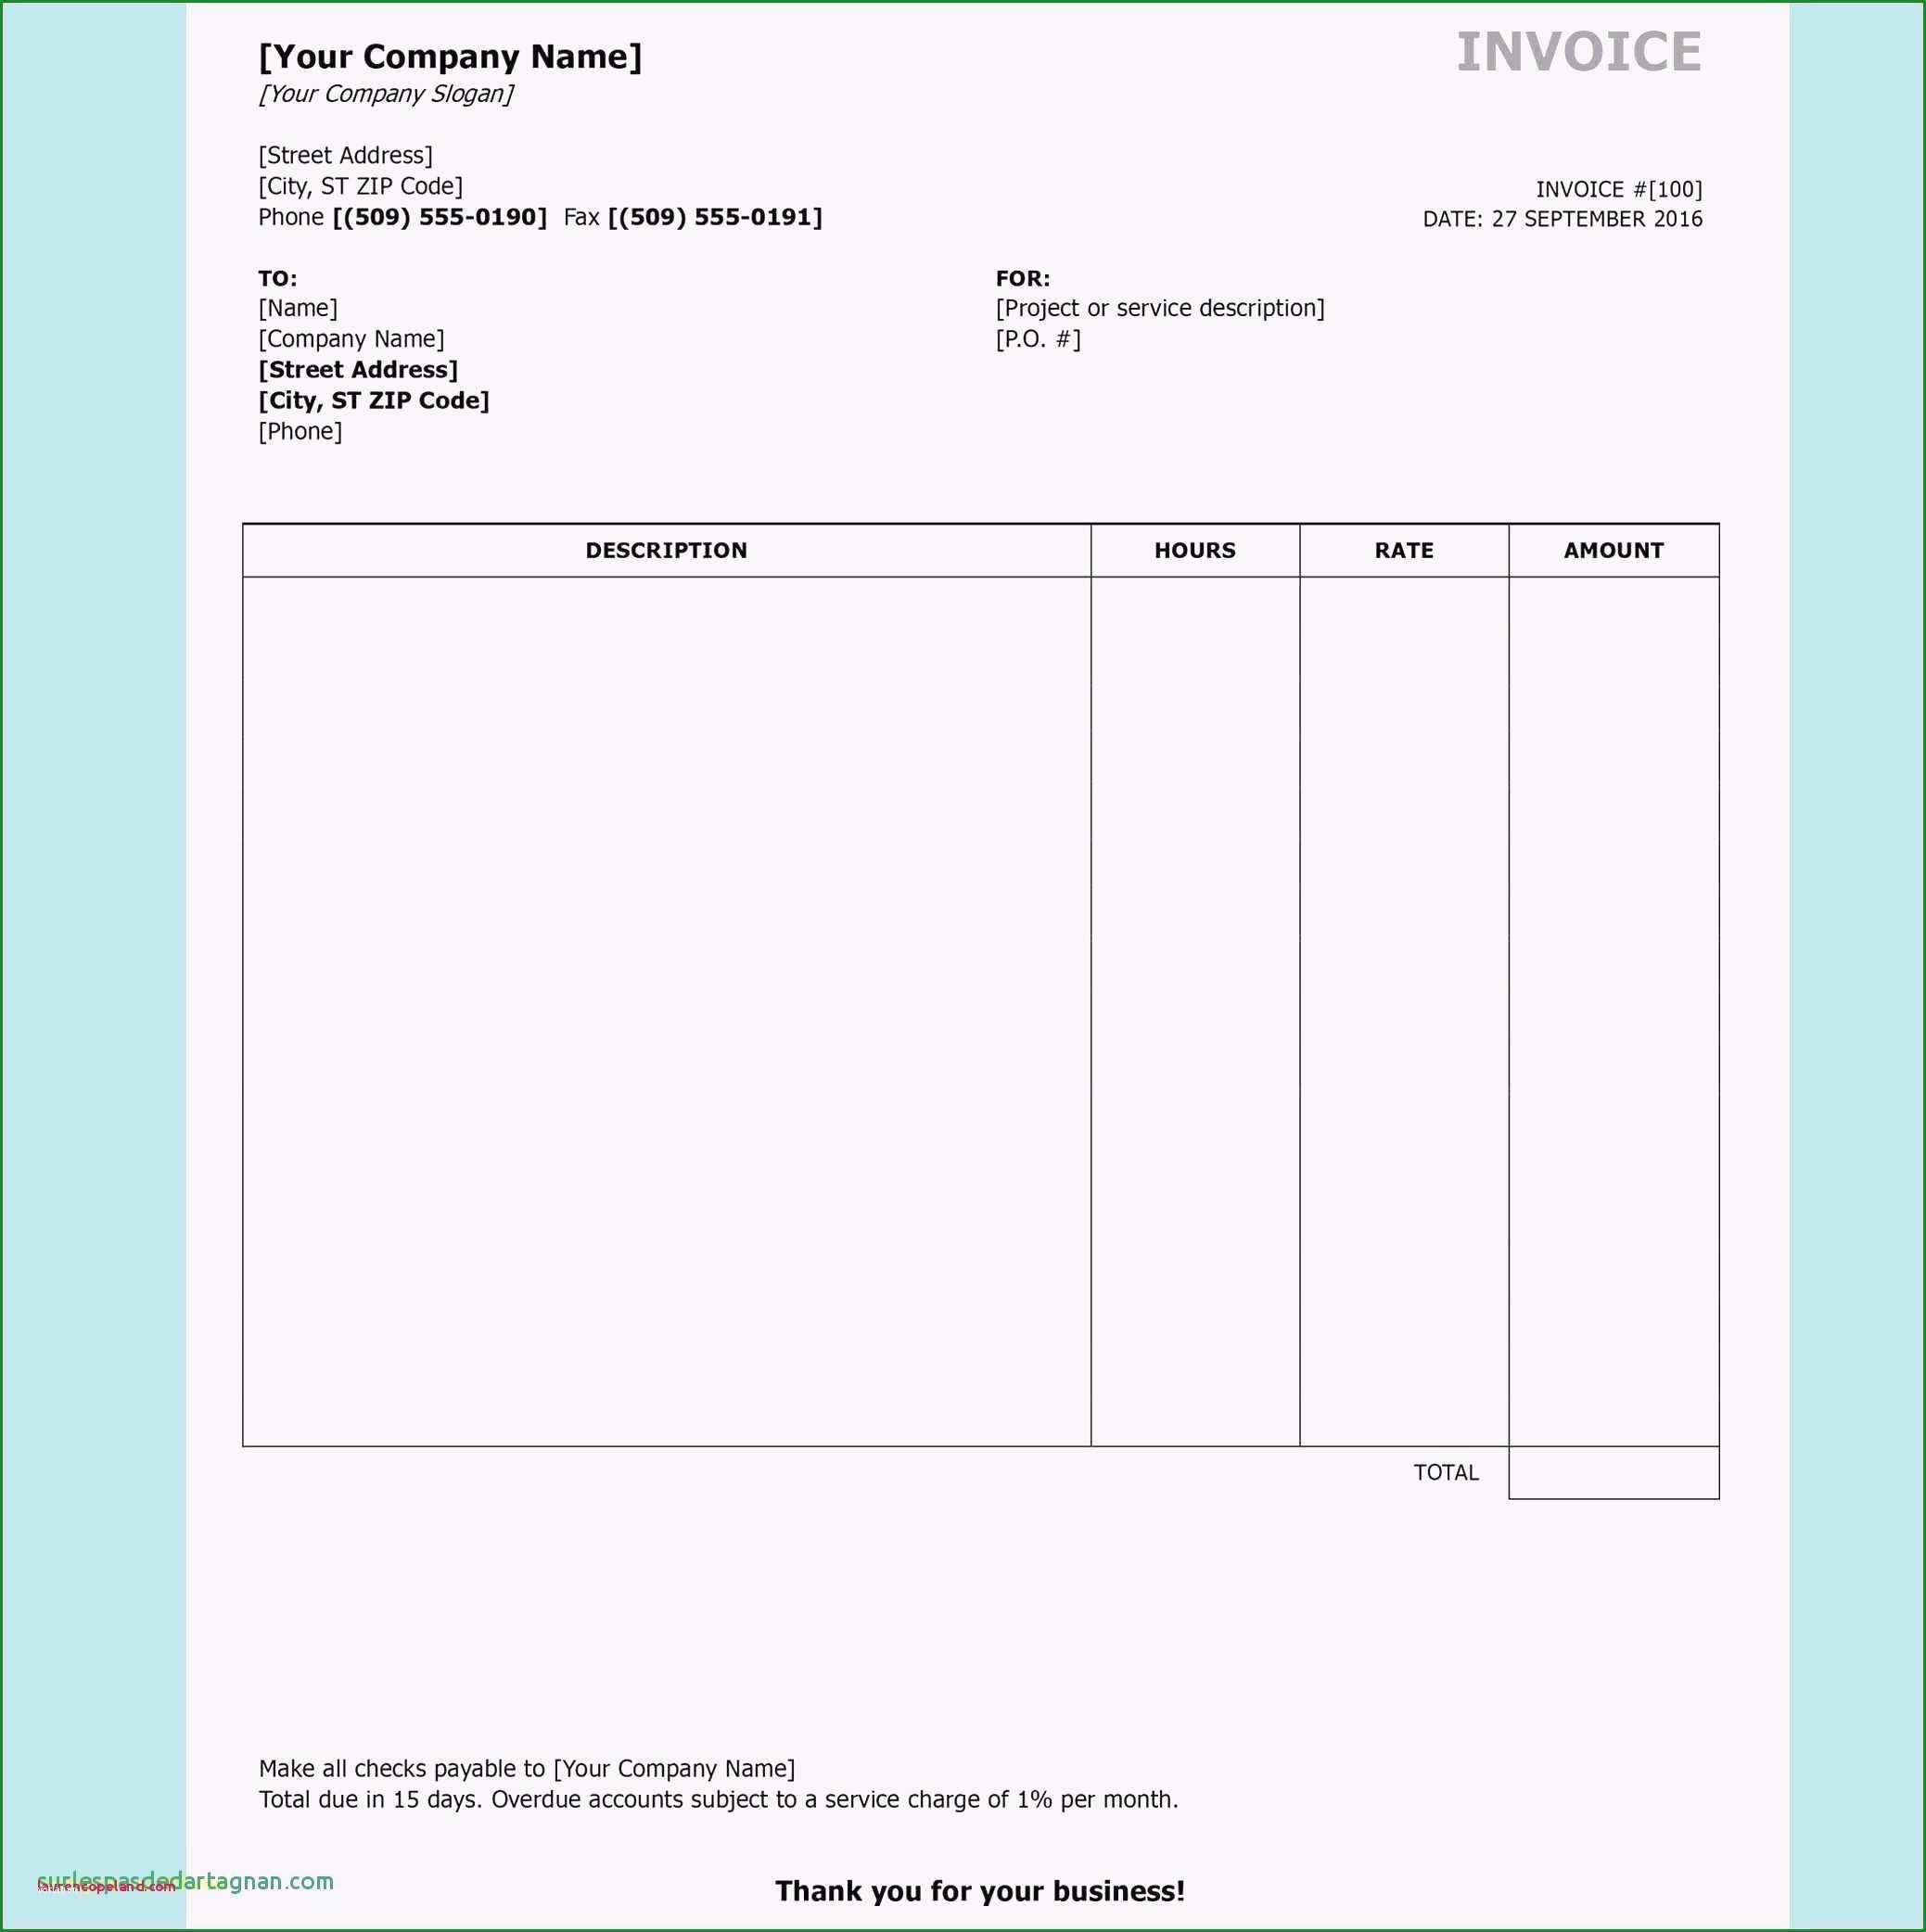 bankverbindung andern vorlage vorlage anderung bankverbindung eur lex r0341 en eur lex